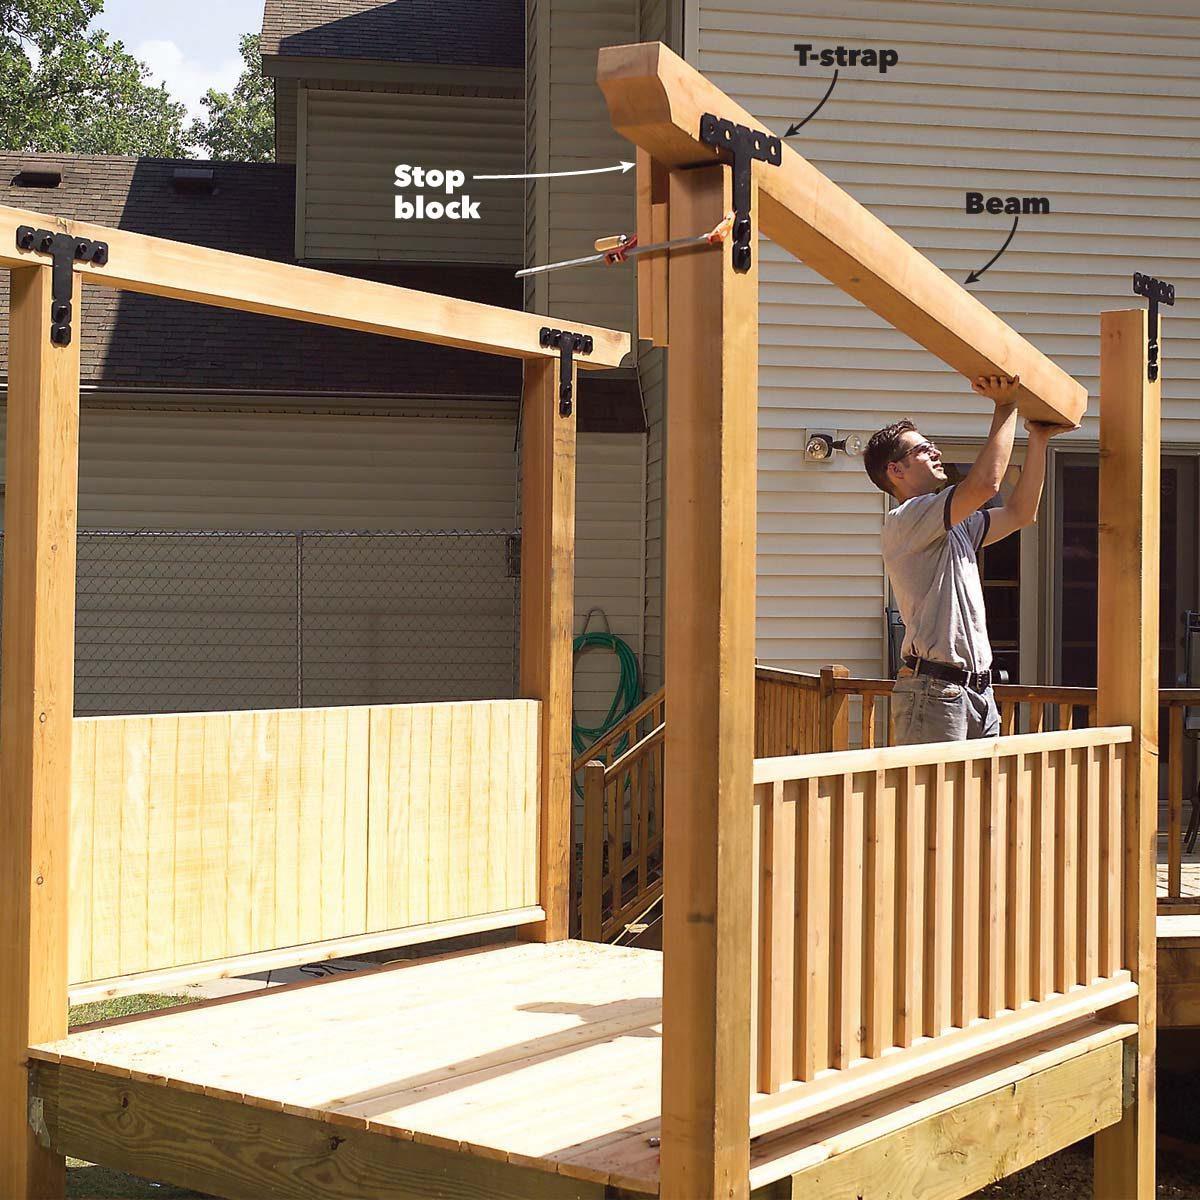 How to Build a Backyard Oasis | Family Handyman